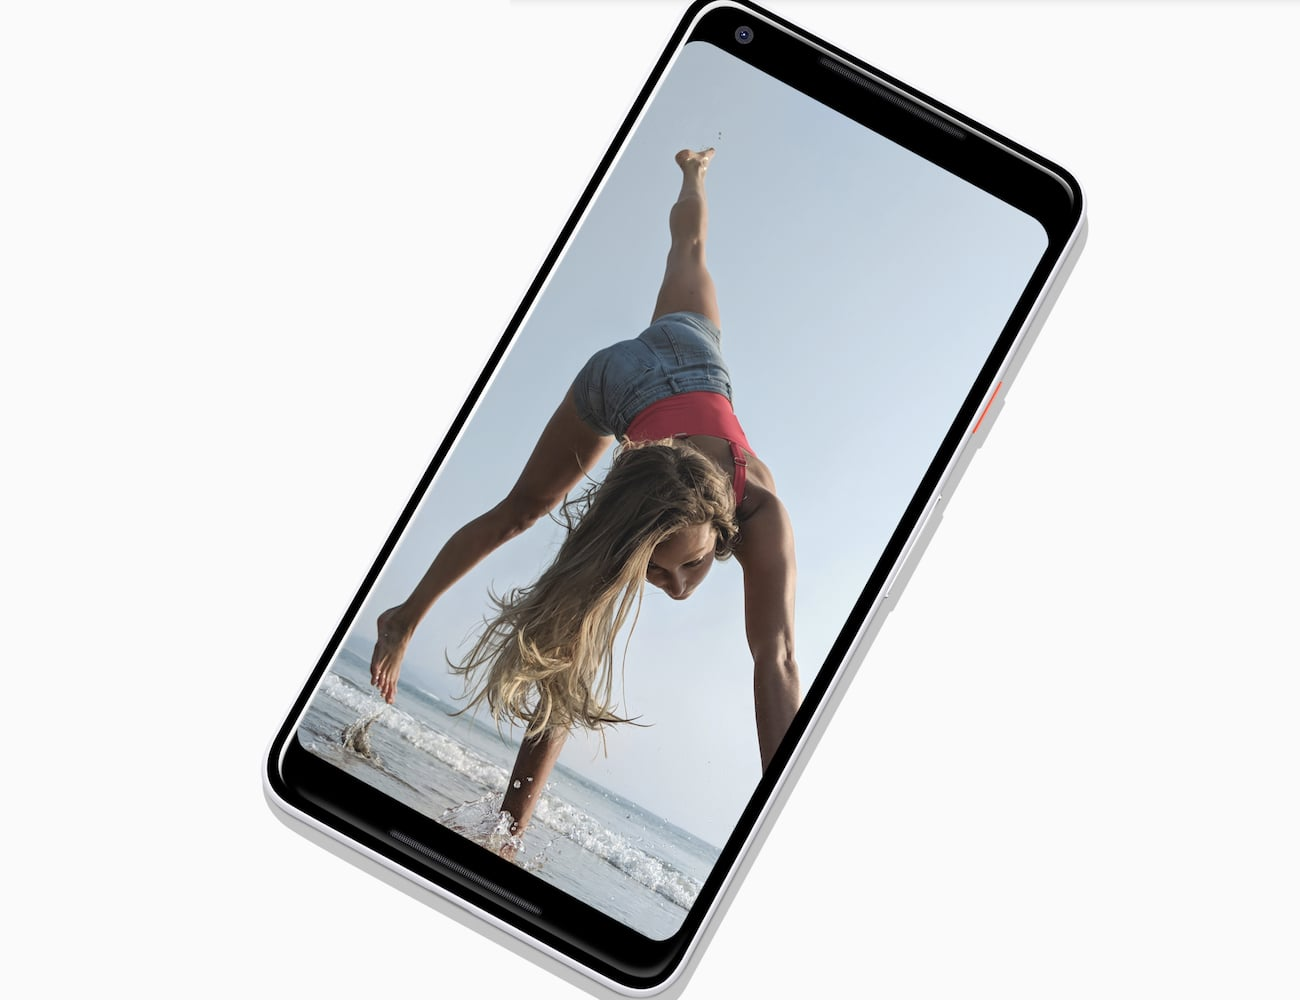 Google Pixel 2 Android Smartphone